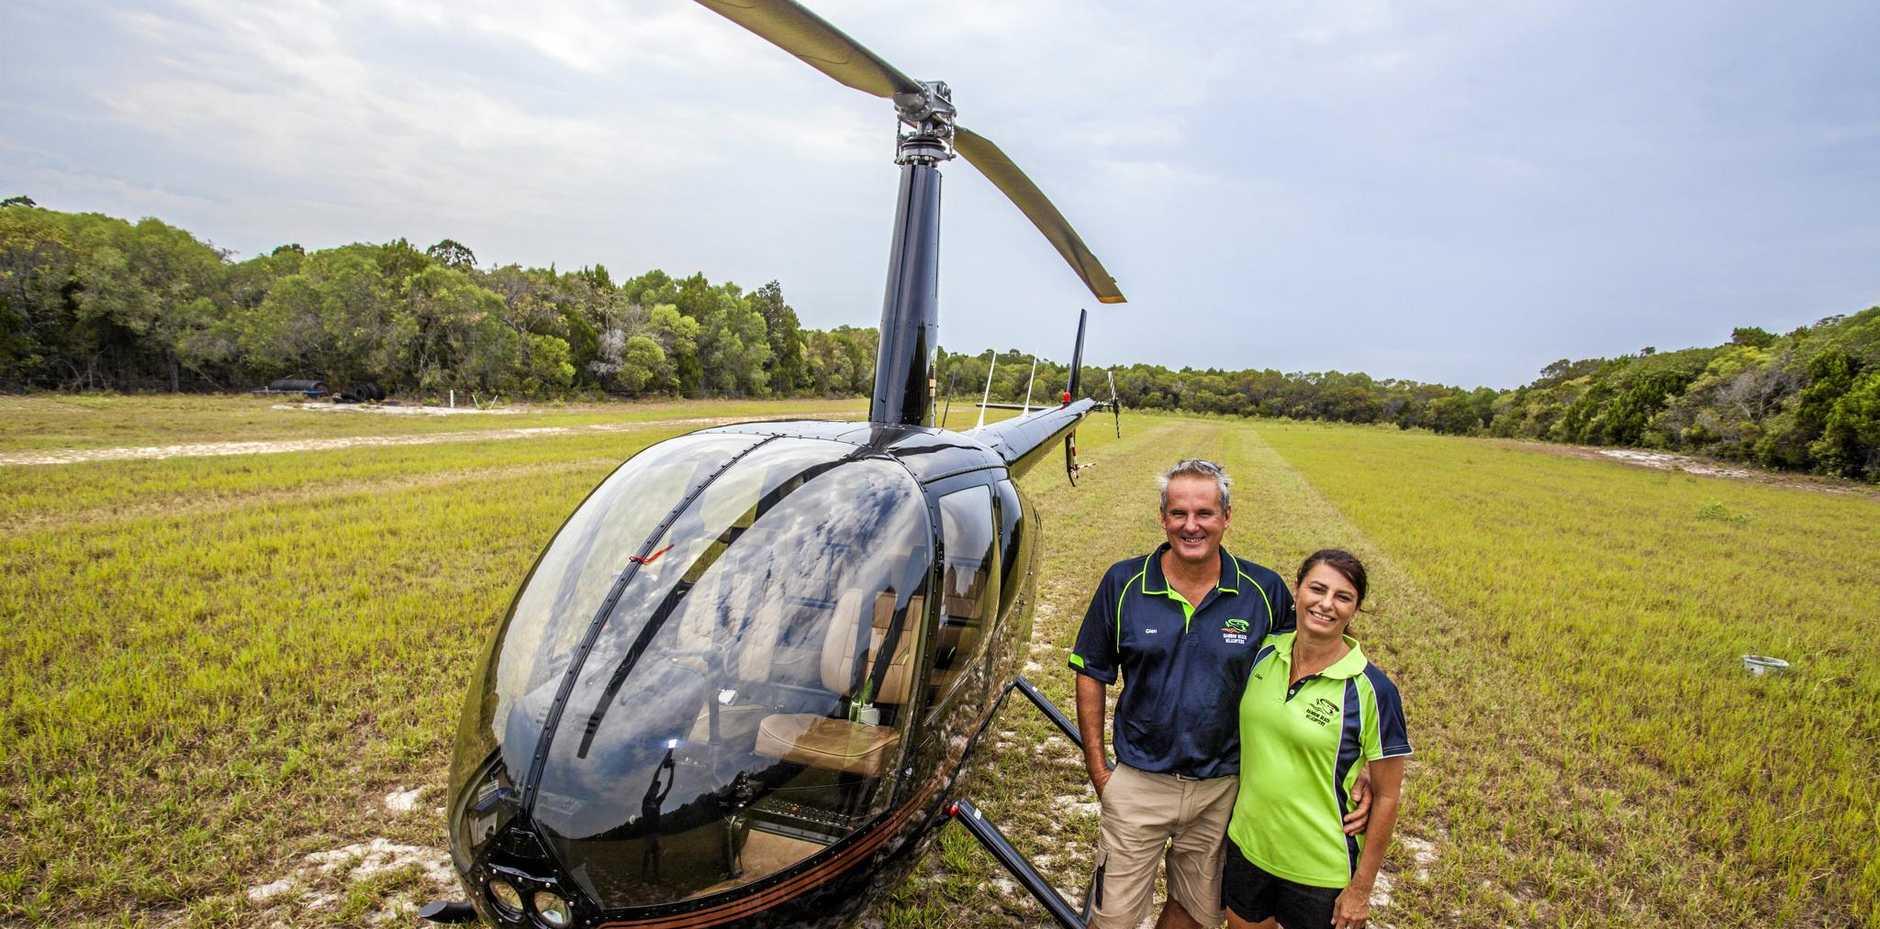 TAKE FLIGHT: Glen Cruickshank and Diana Journeaux, of Mooloolaba, ready to take off.